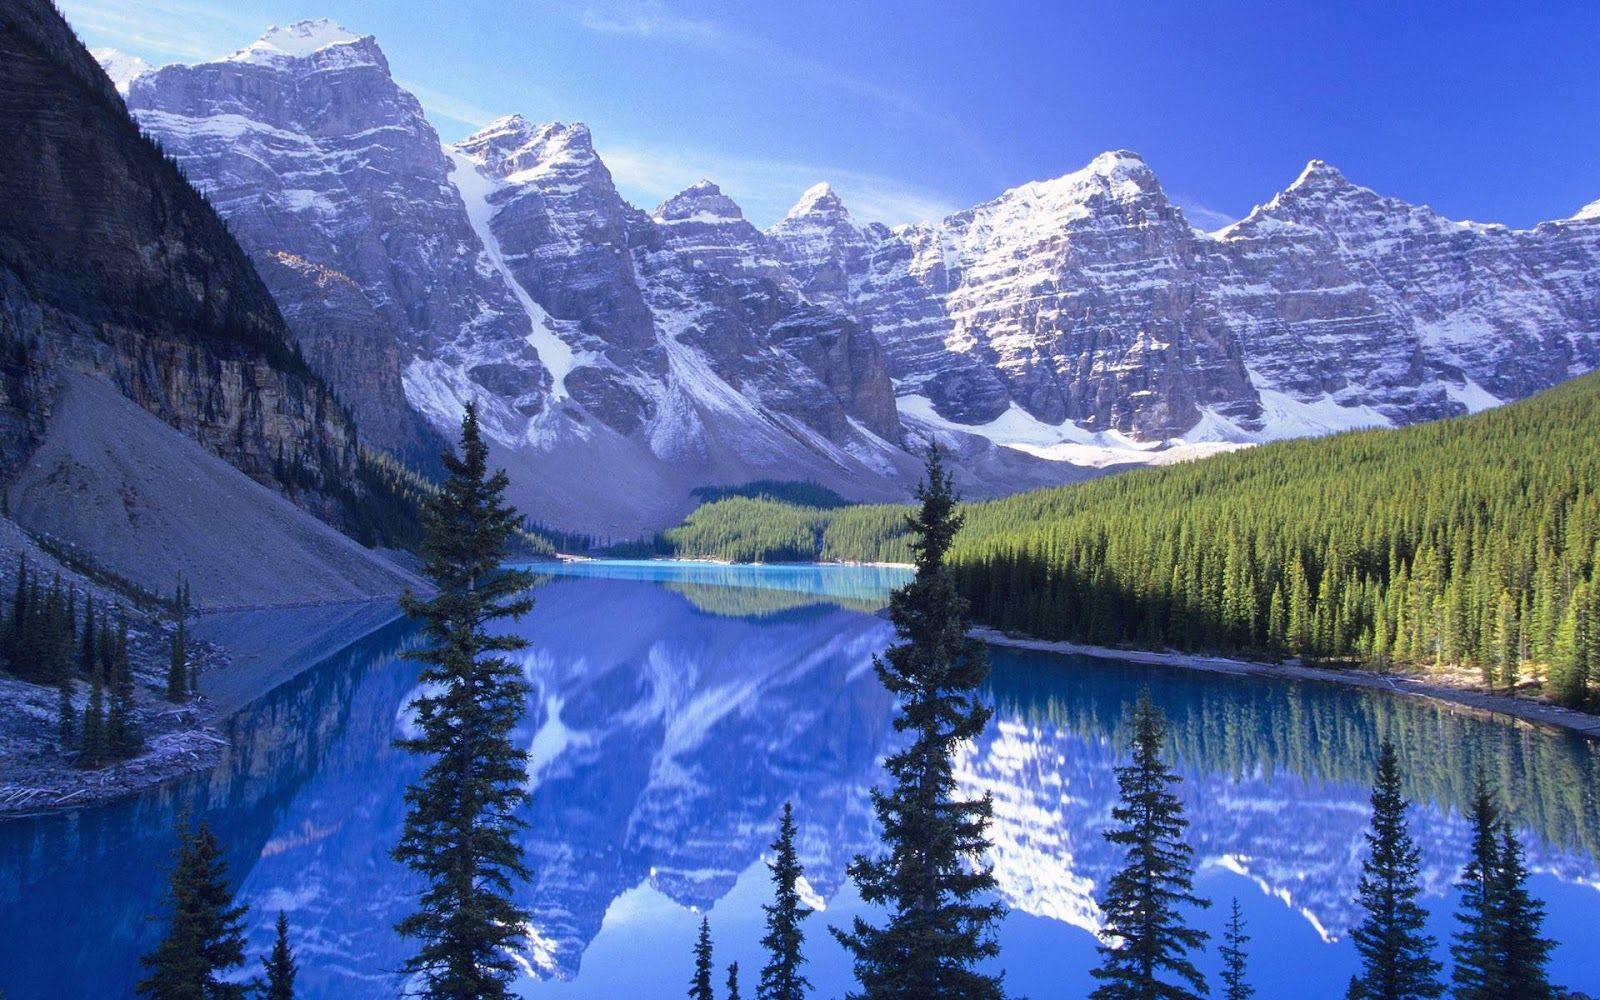 Computer Wallpaper Pc Desktop Screen Saver Canada National Parks Alberta National Parks Landscape Photos